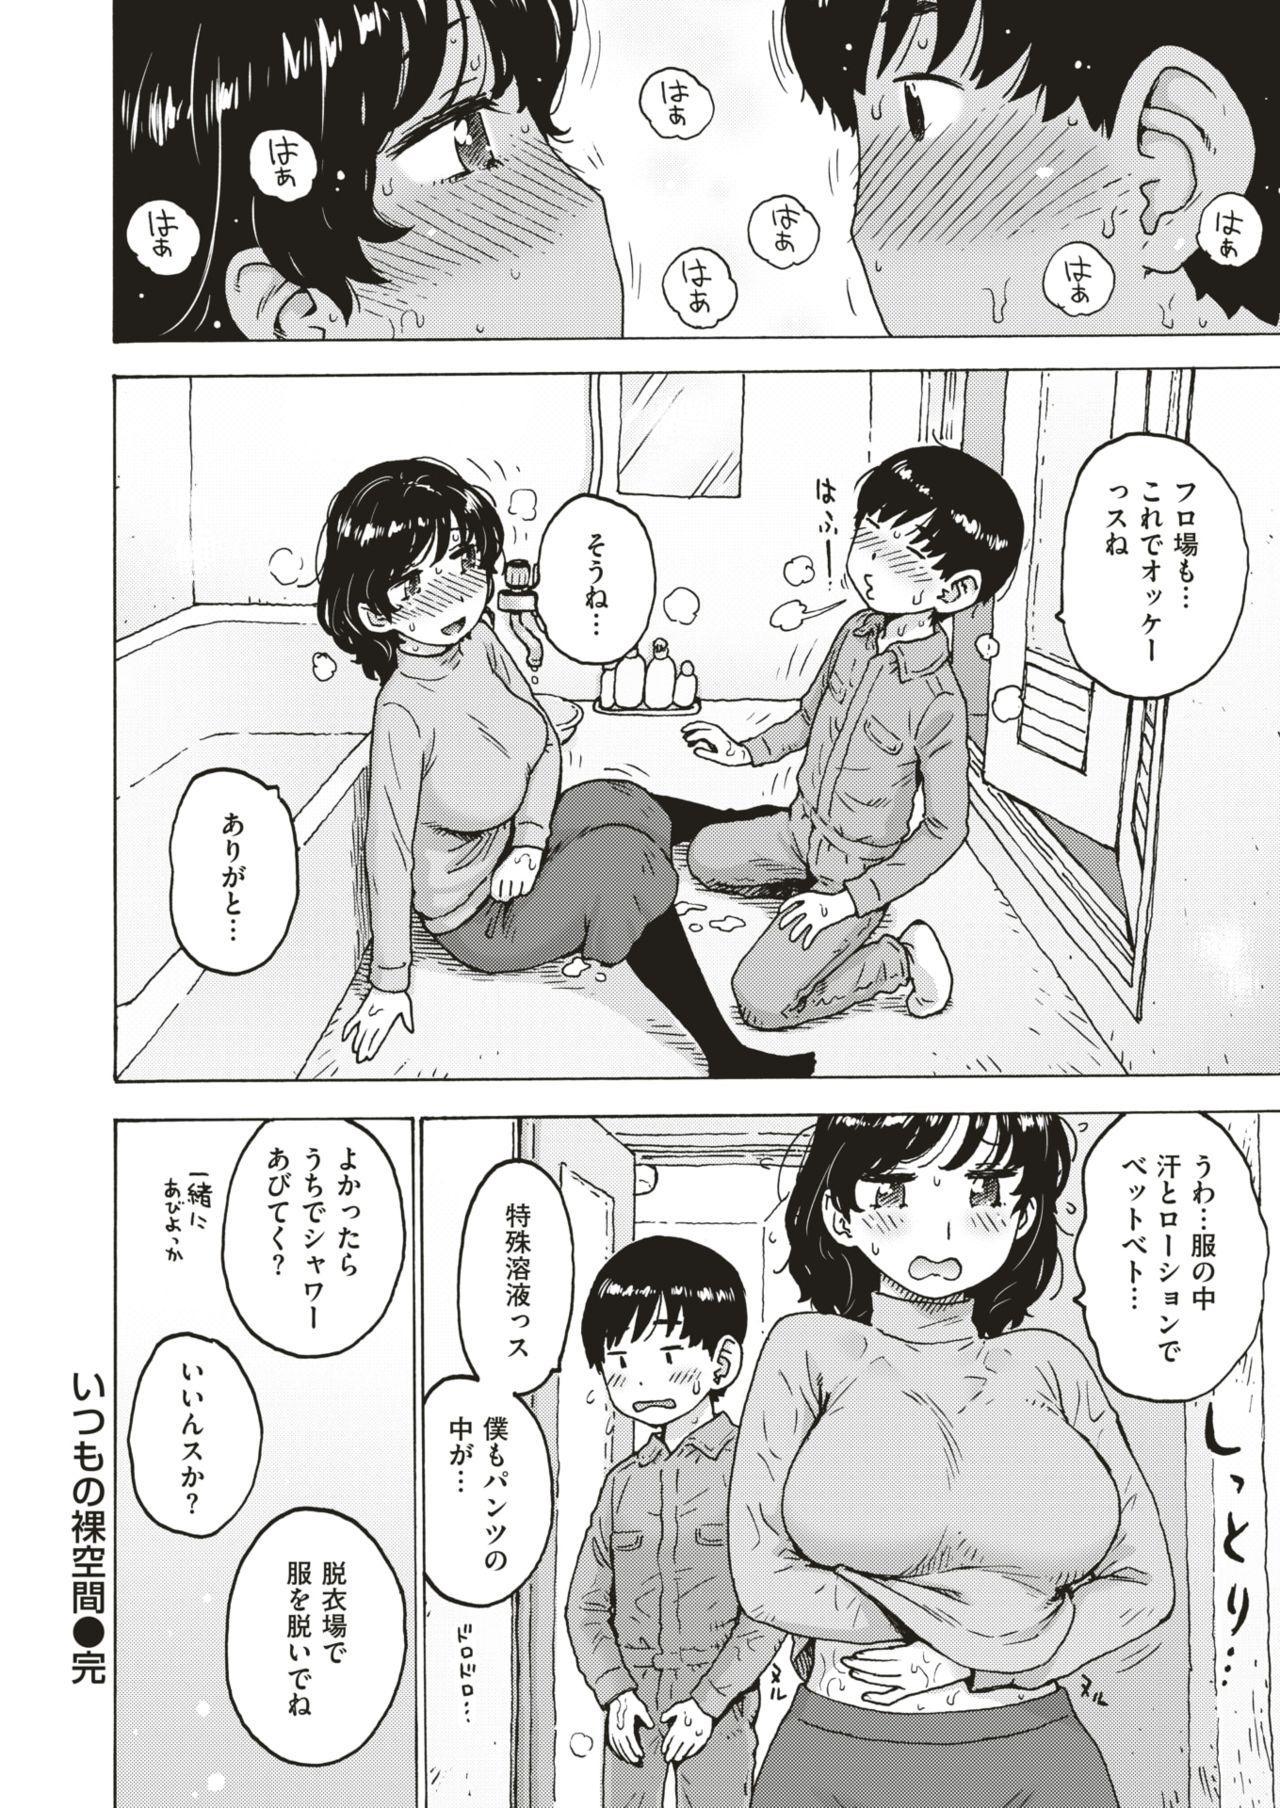 COMIC HAPPINING Vol. 4 48